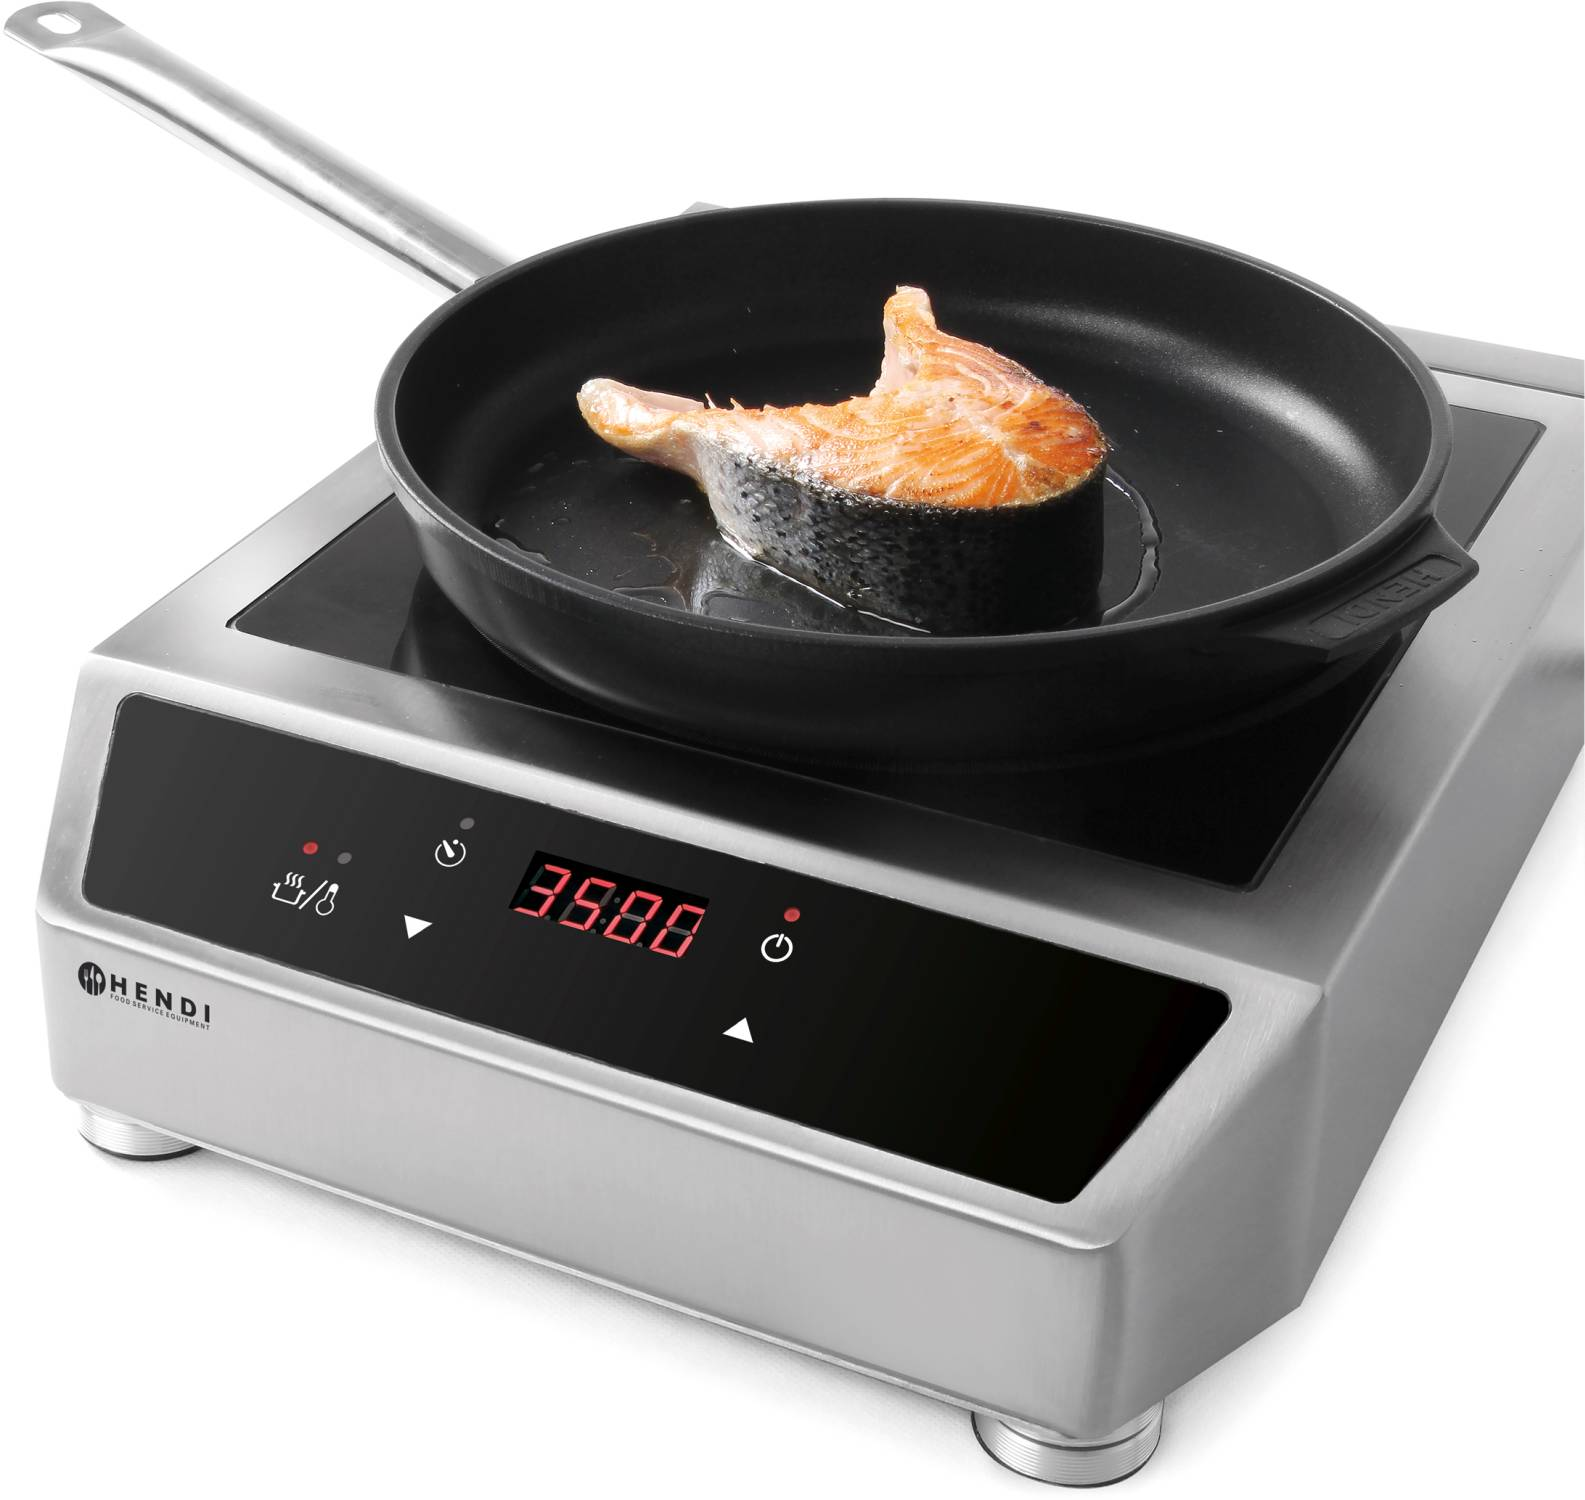 hendi gastro profi digital induktionsherd induction cooker 3500 watt 3 5 kw neu ebay. Black Bedroom Furniture Sets. Home Design Ideas